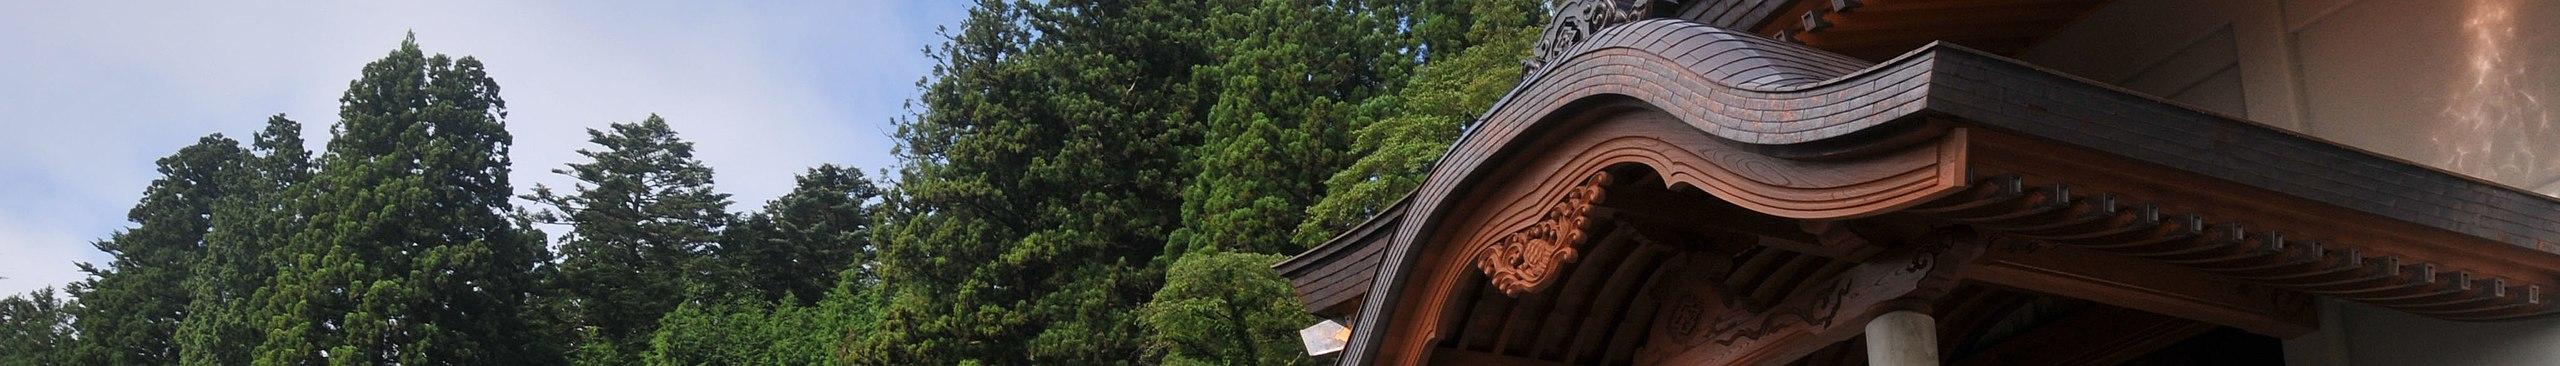 Ikeda (Tokushima) – Travel guide at Wikivoyage